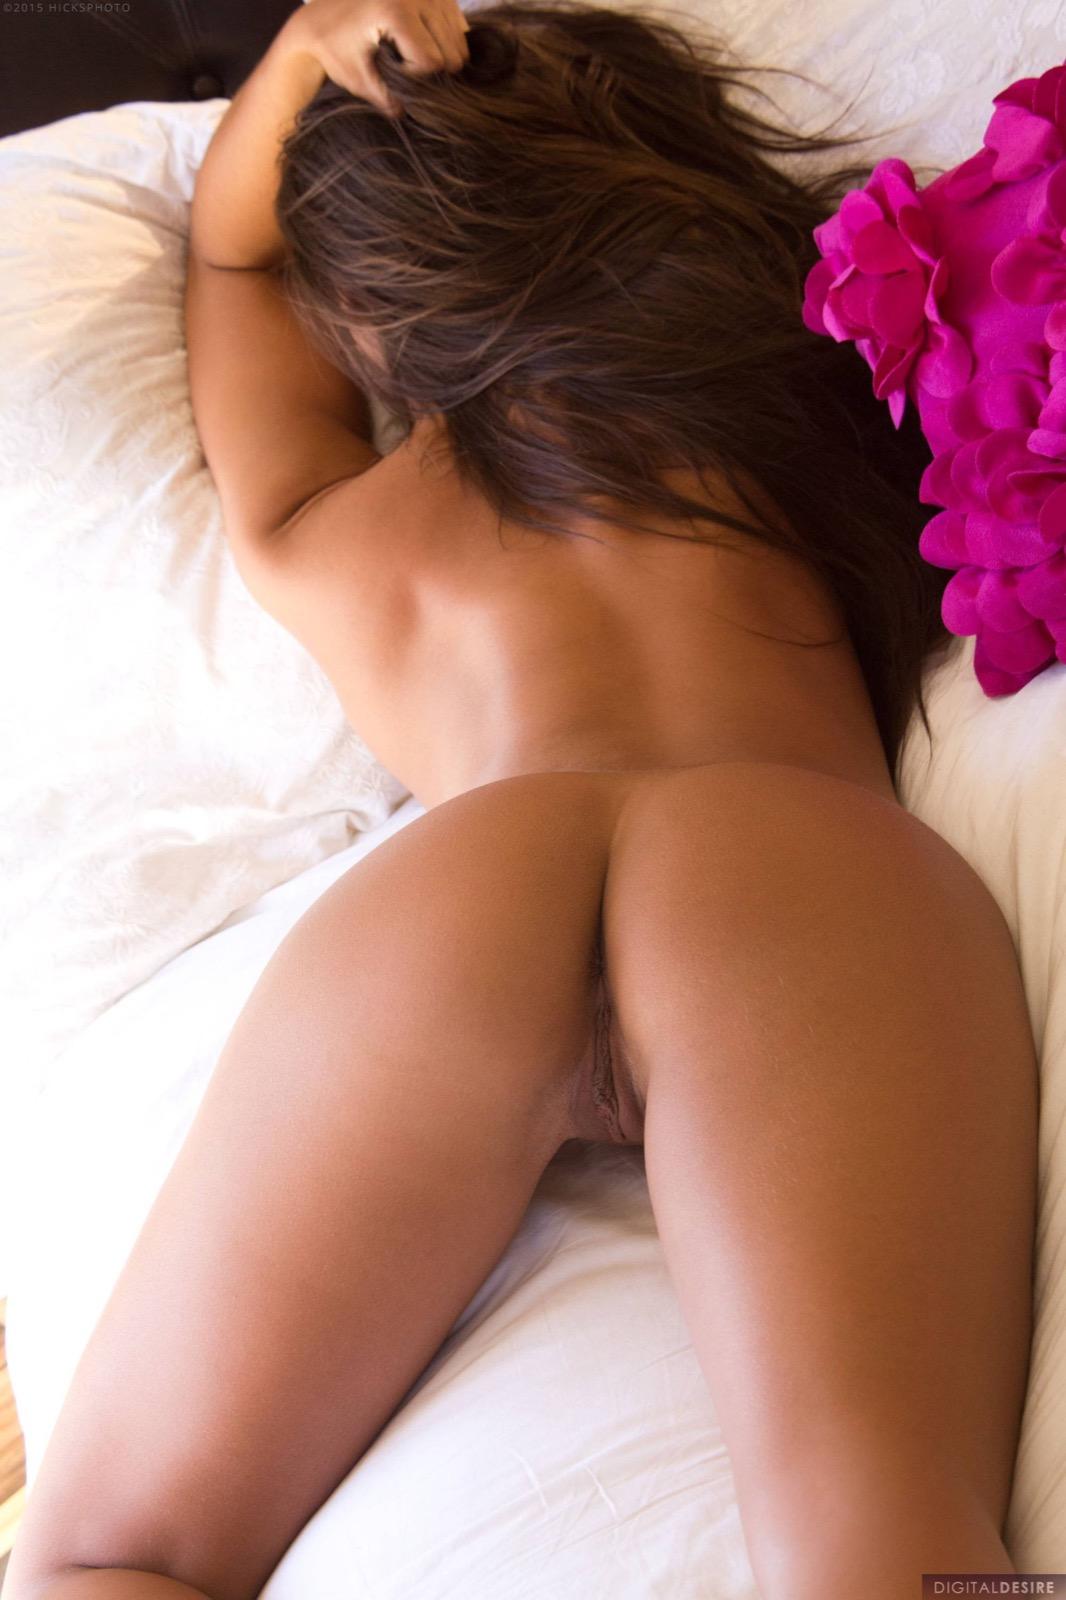 Adult couples sex positions porn